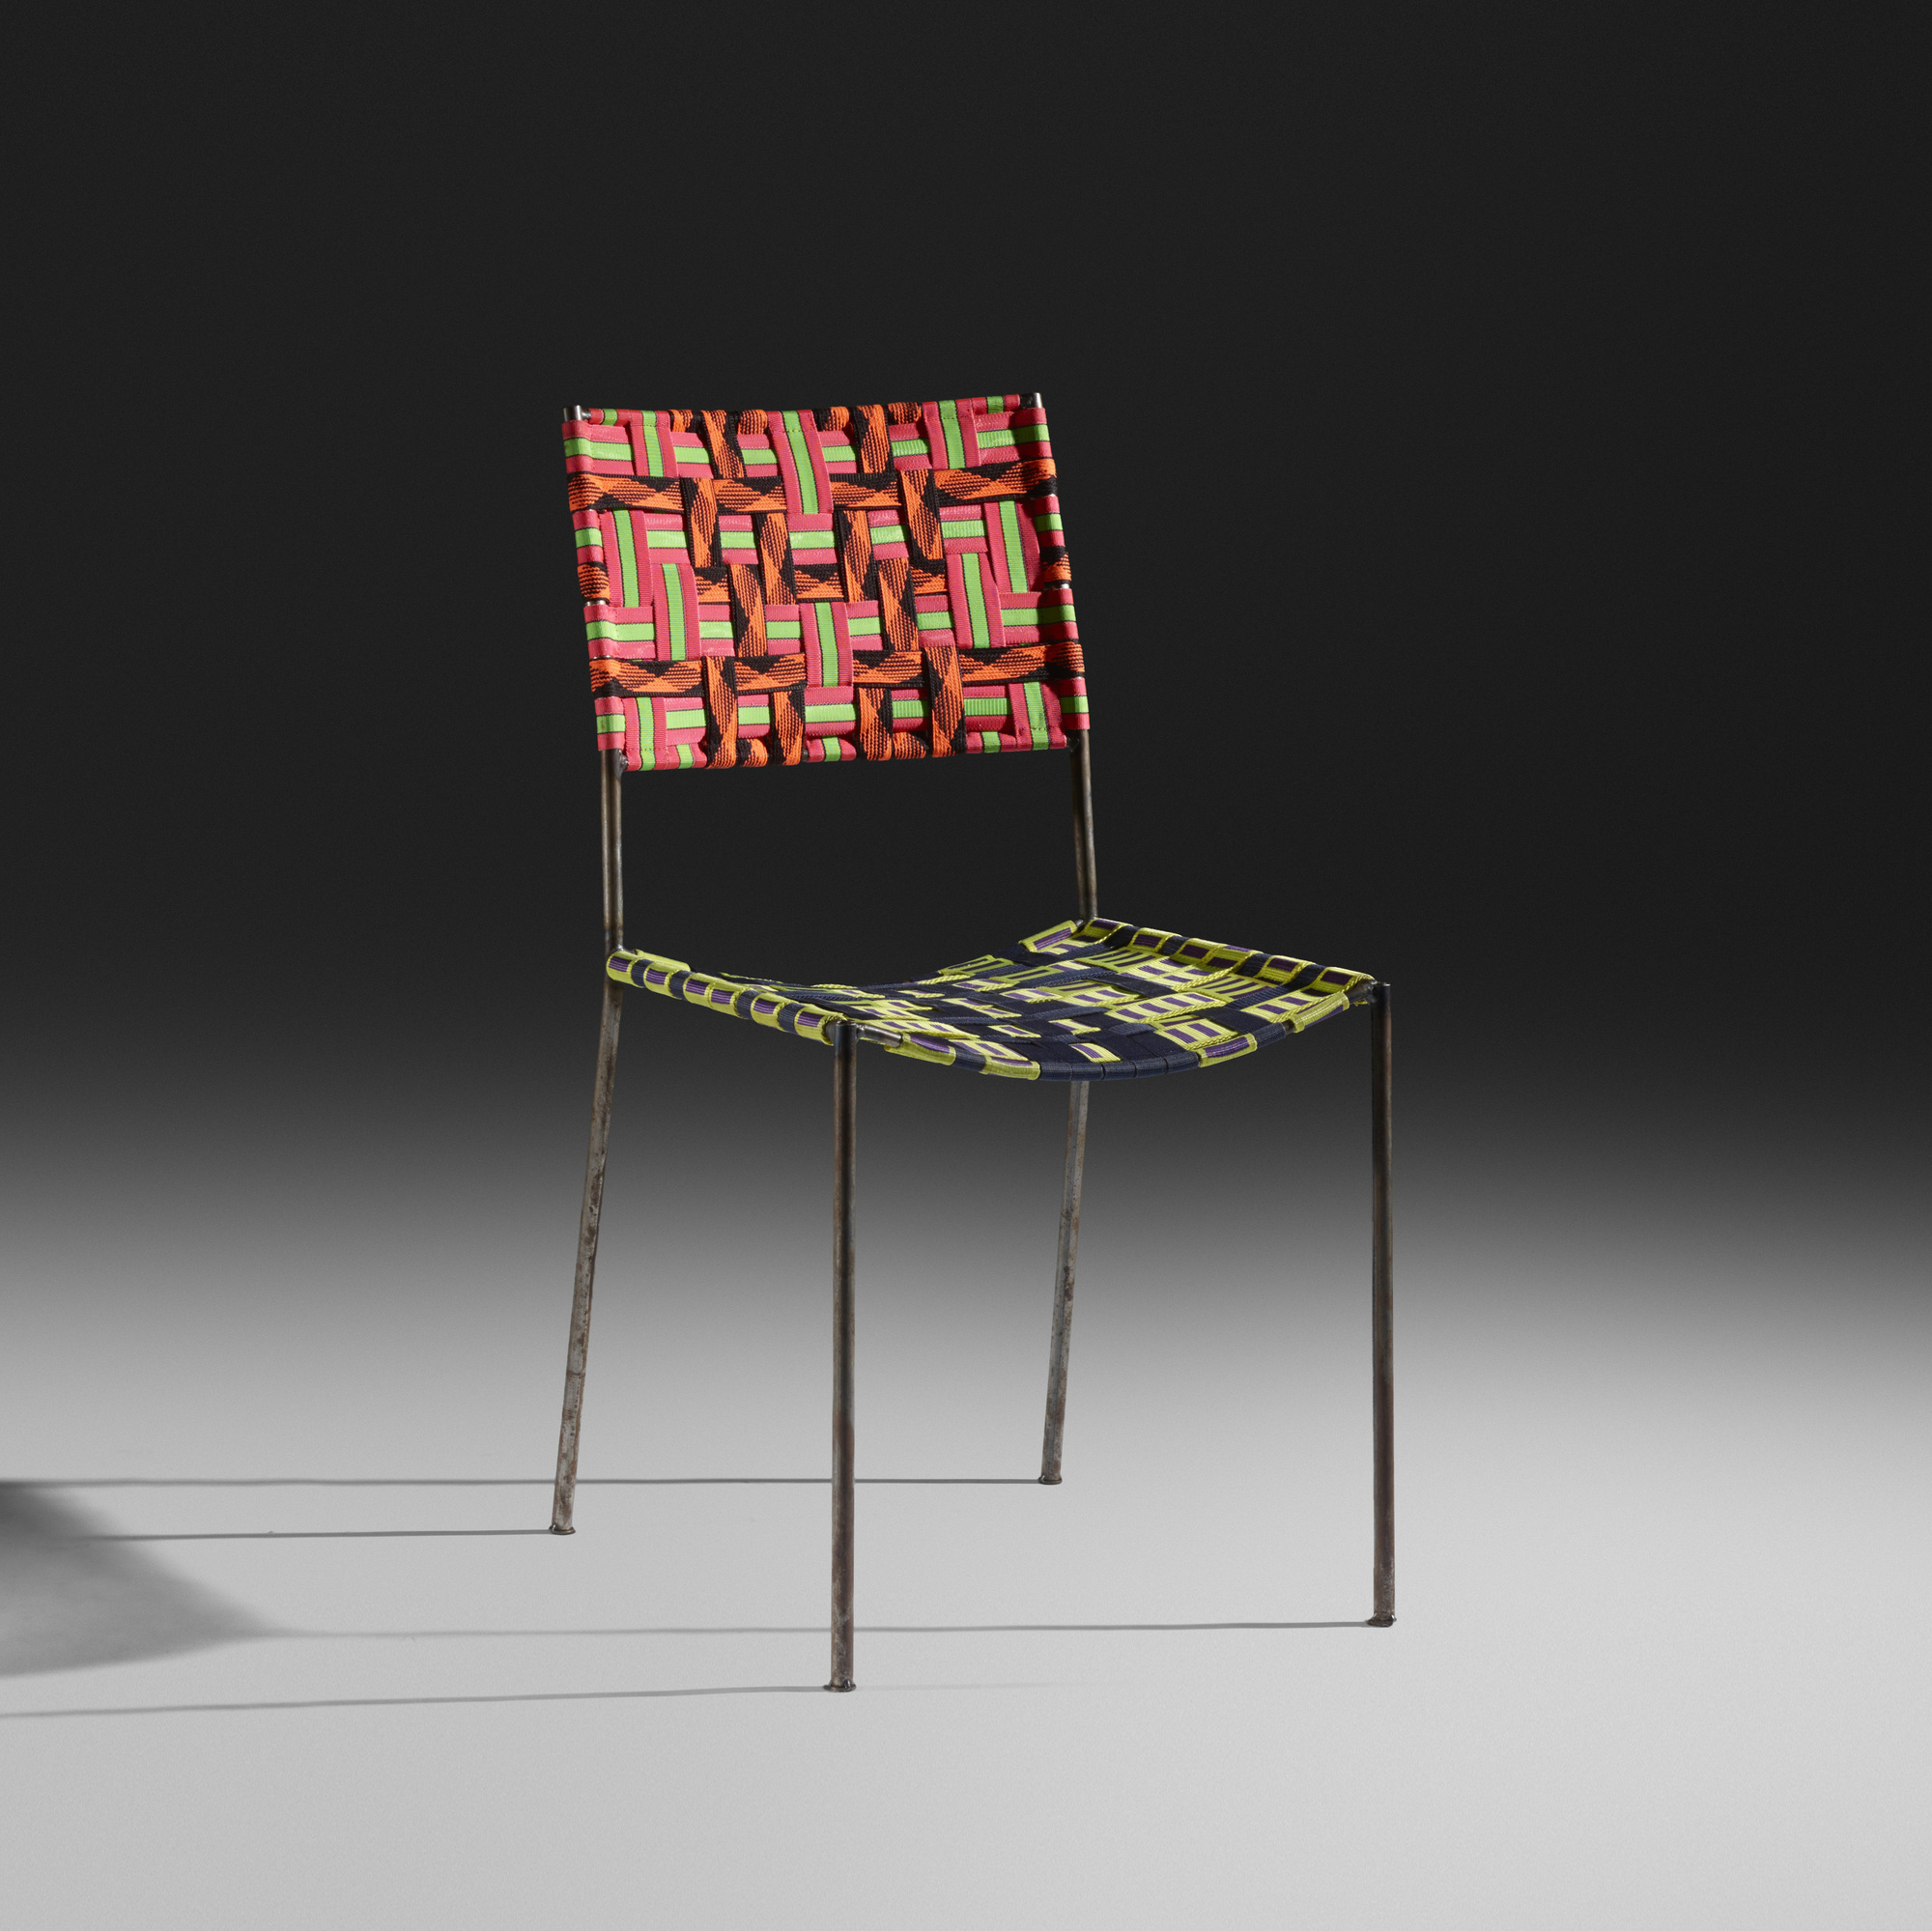 235: Franz West / Onkel chair (1 of 3)